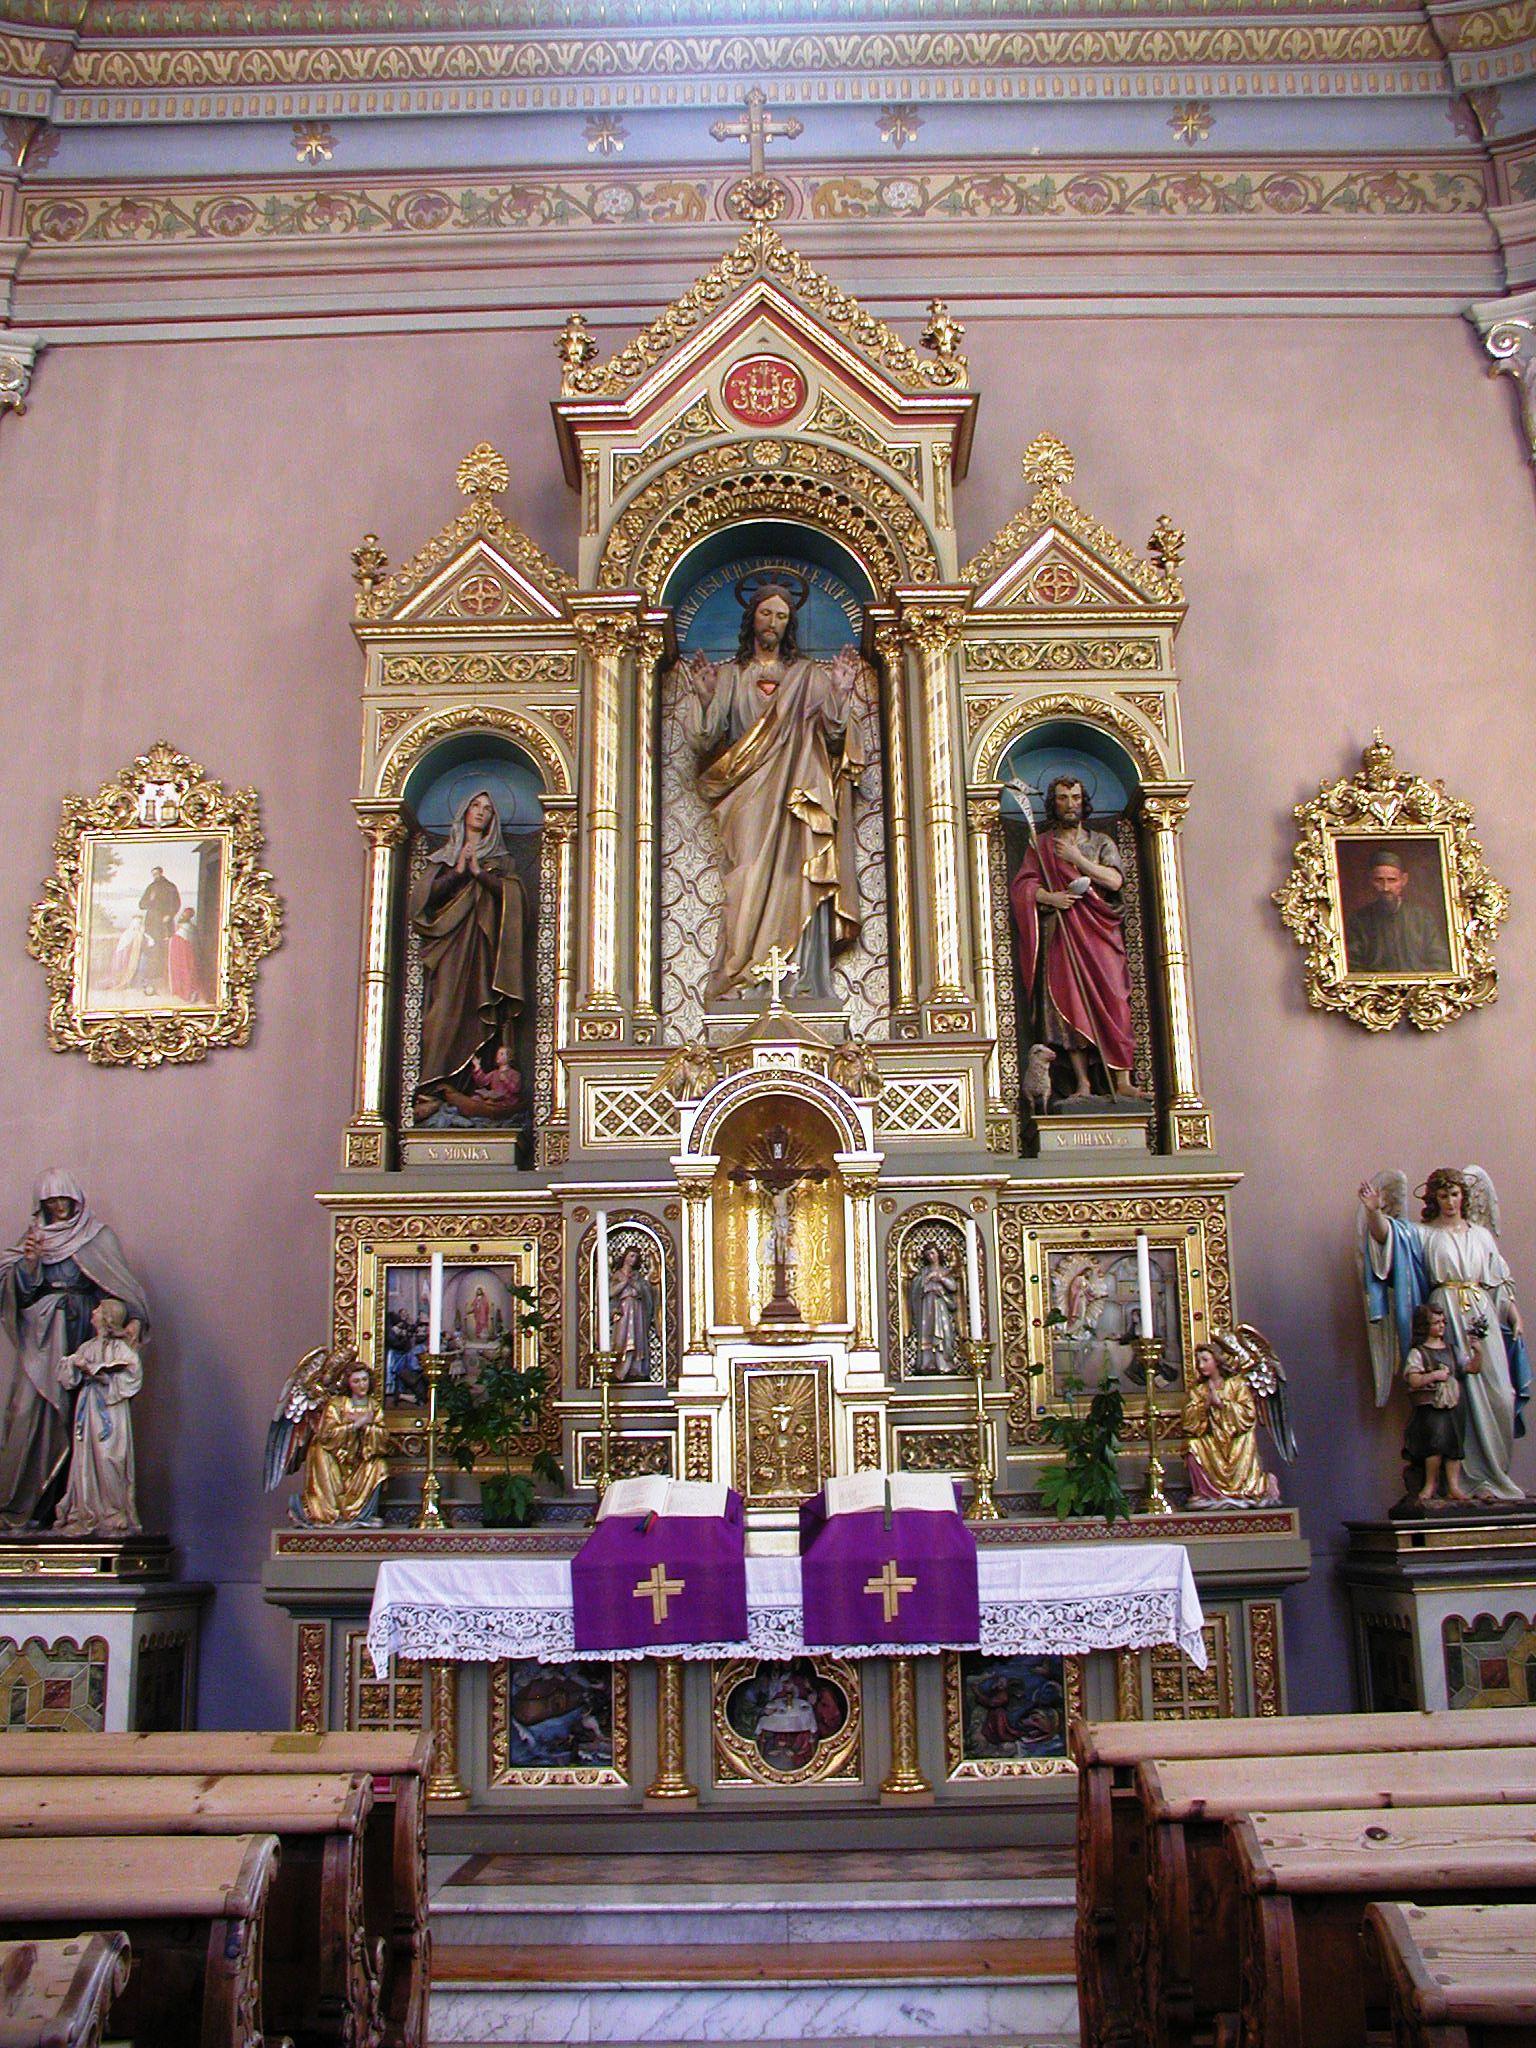 Finest Catholic Altars and Church Interiors